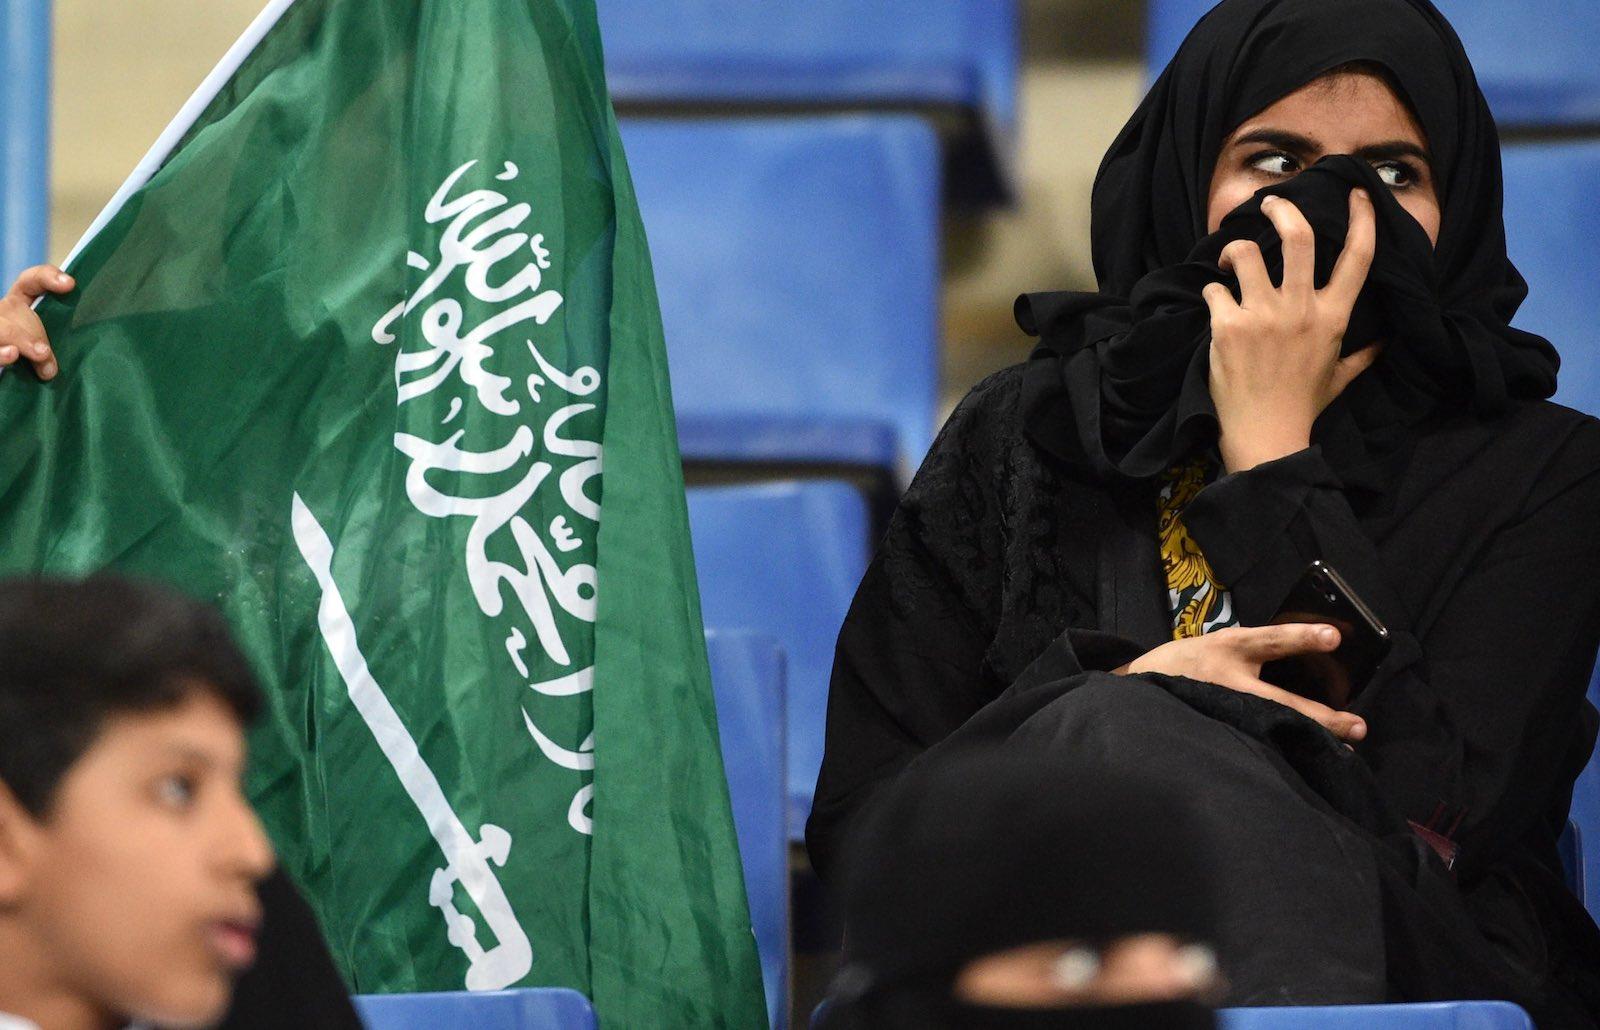 In Saudi Arabia, guardianship restrictions last from birth until death (Photo: Fayez Nureldine via Getty)